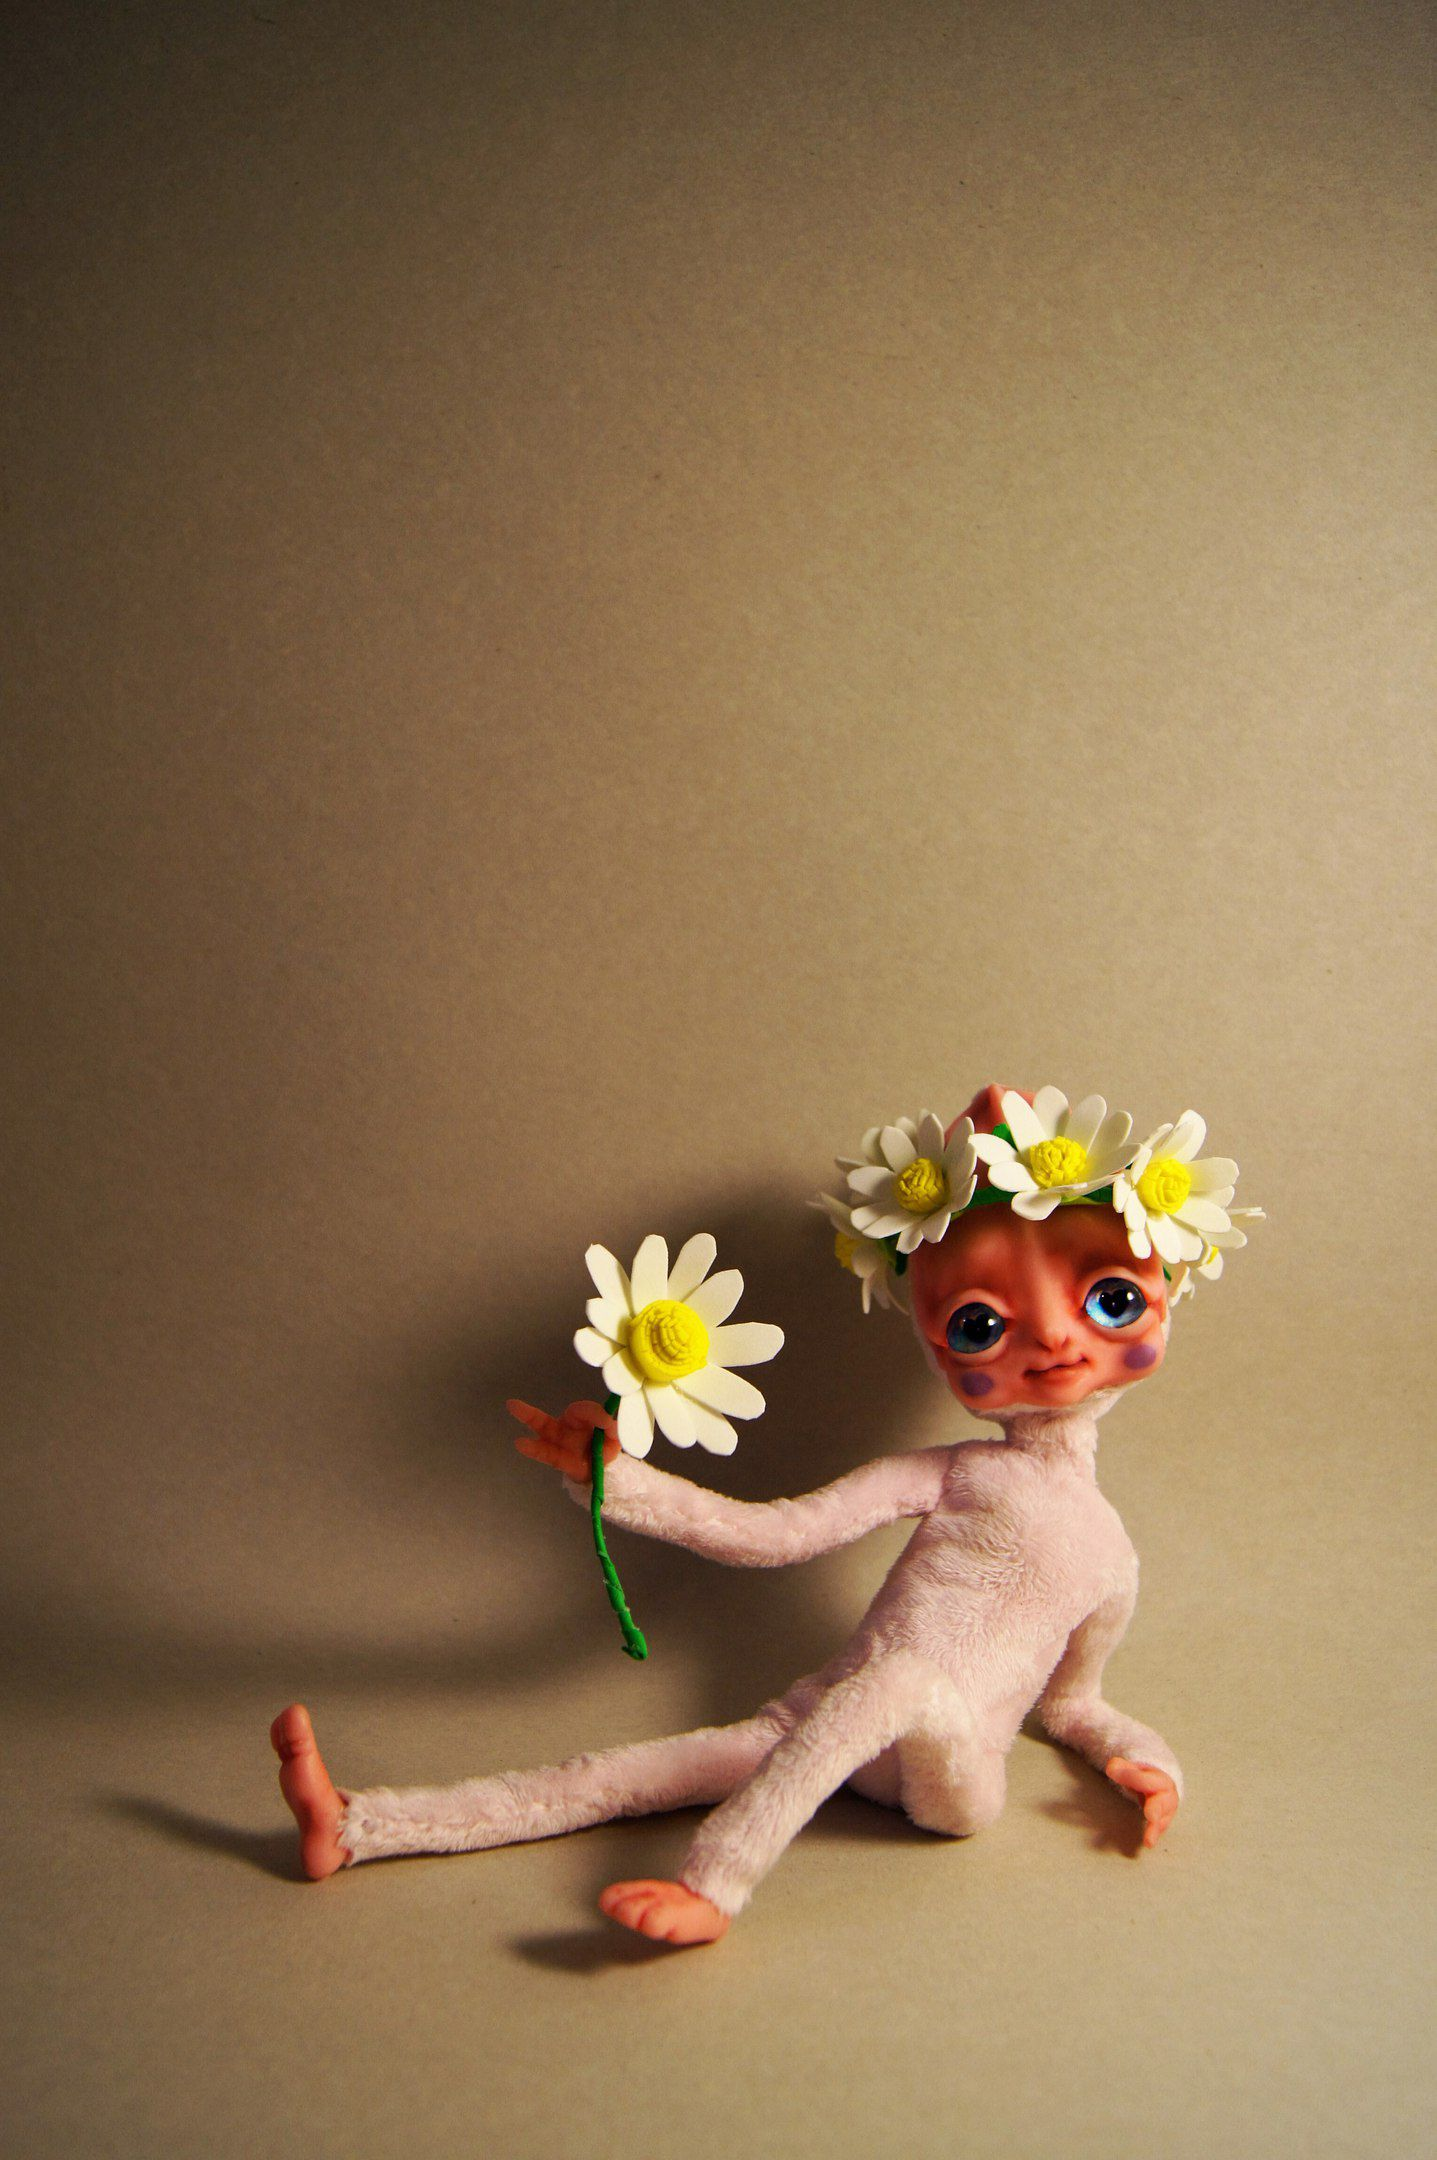 пришелец ручнаяработа кукла интерьерная каркасная инопланетянка